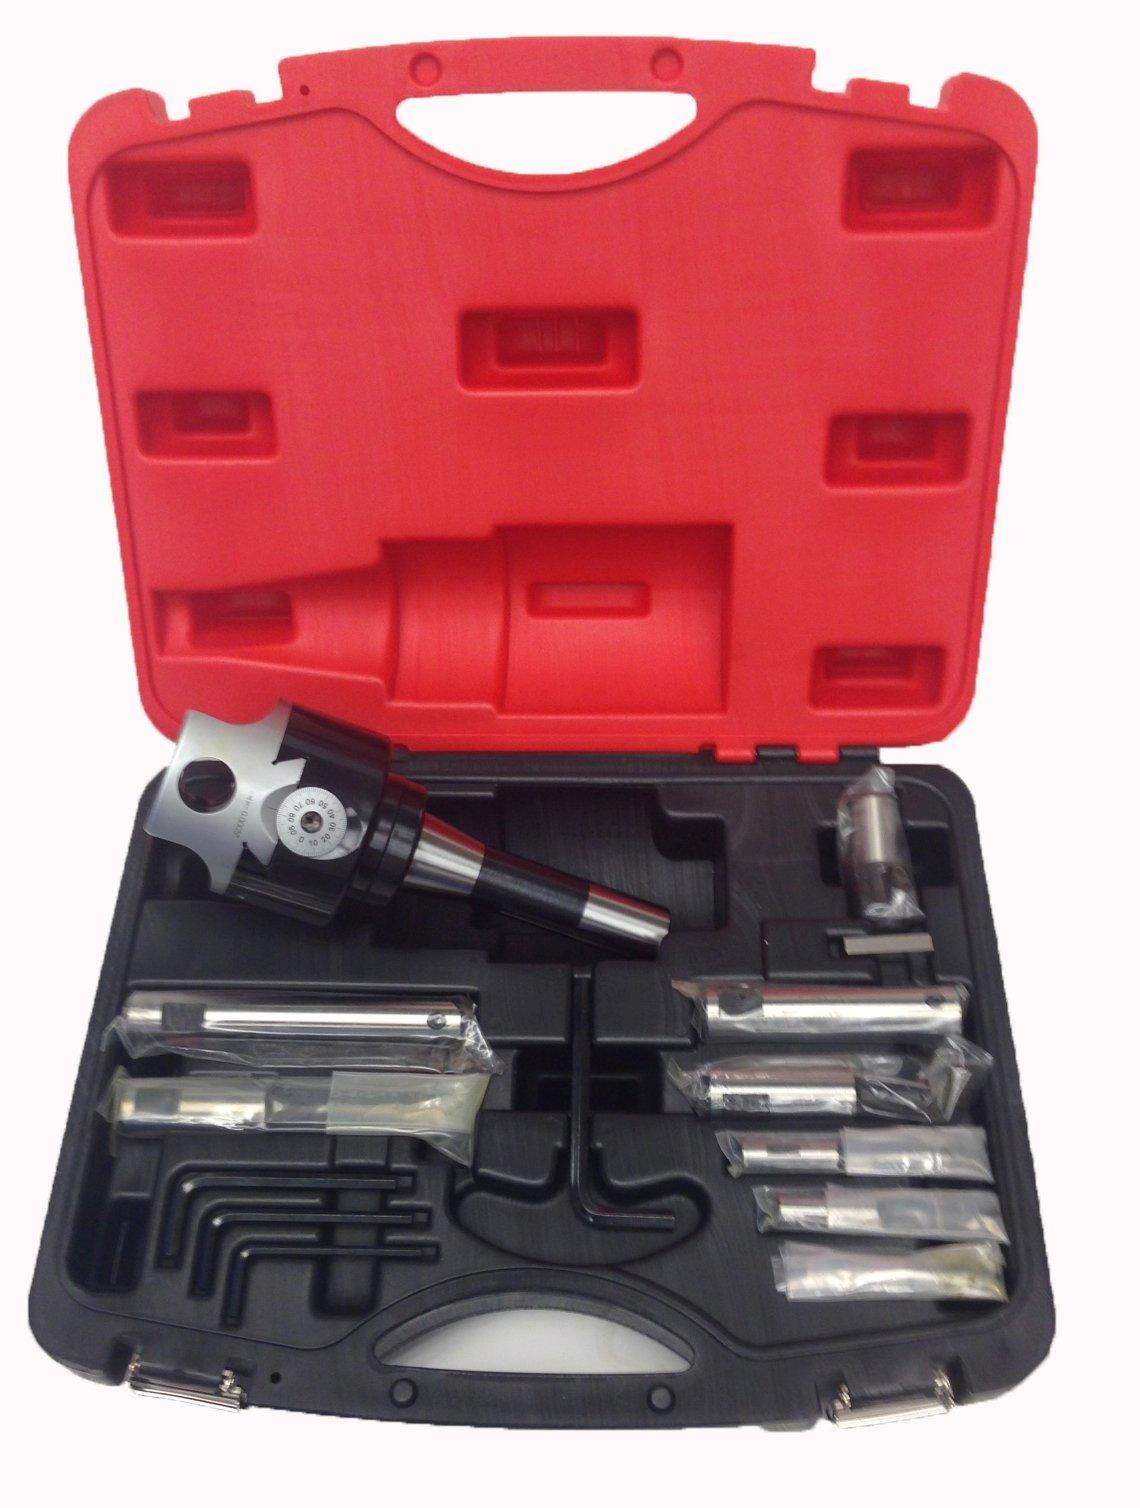 HHIP 3800-5940 R8 3 Inch Head Boring Tool Set